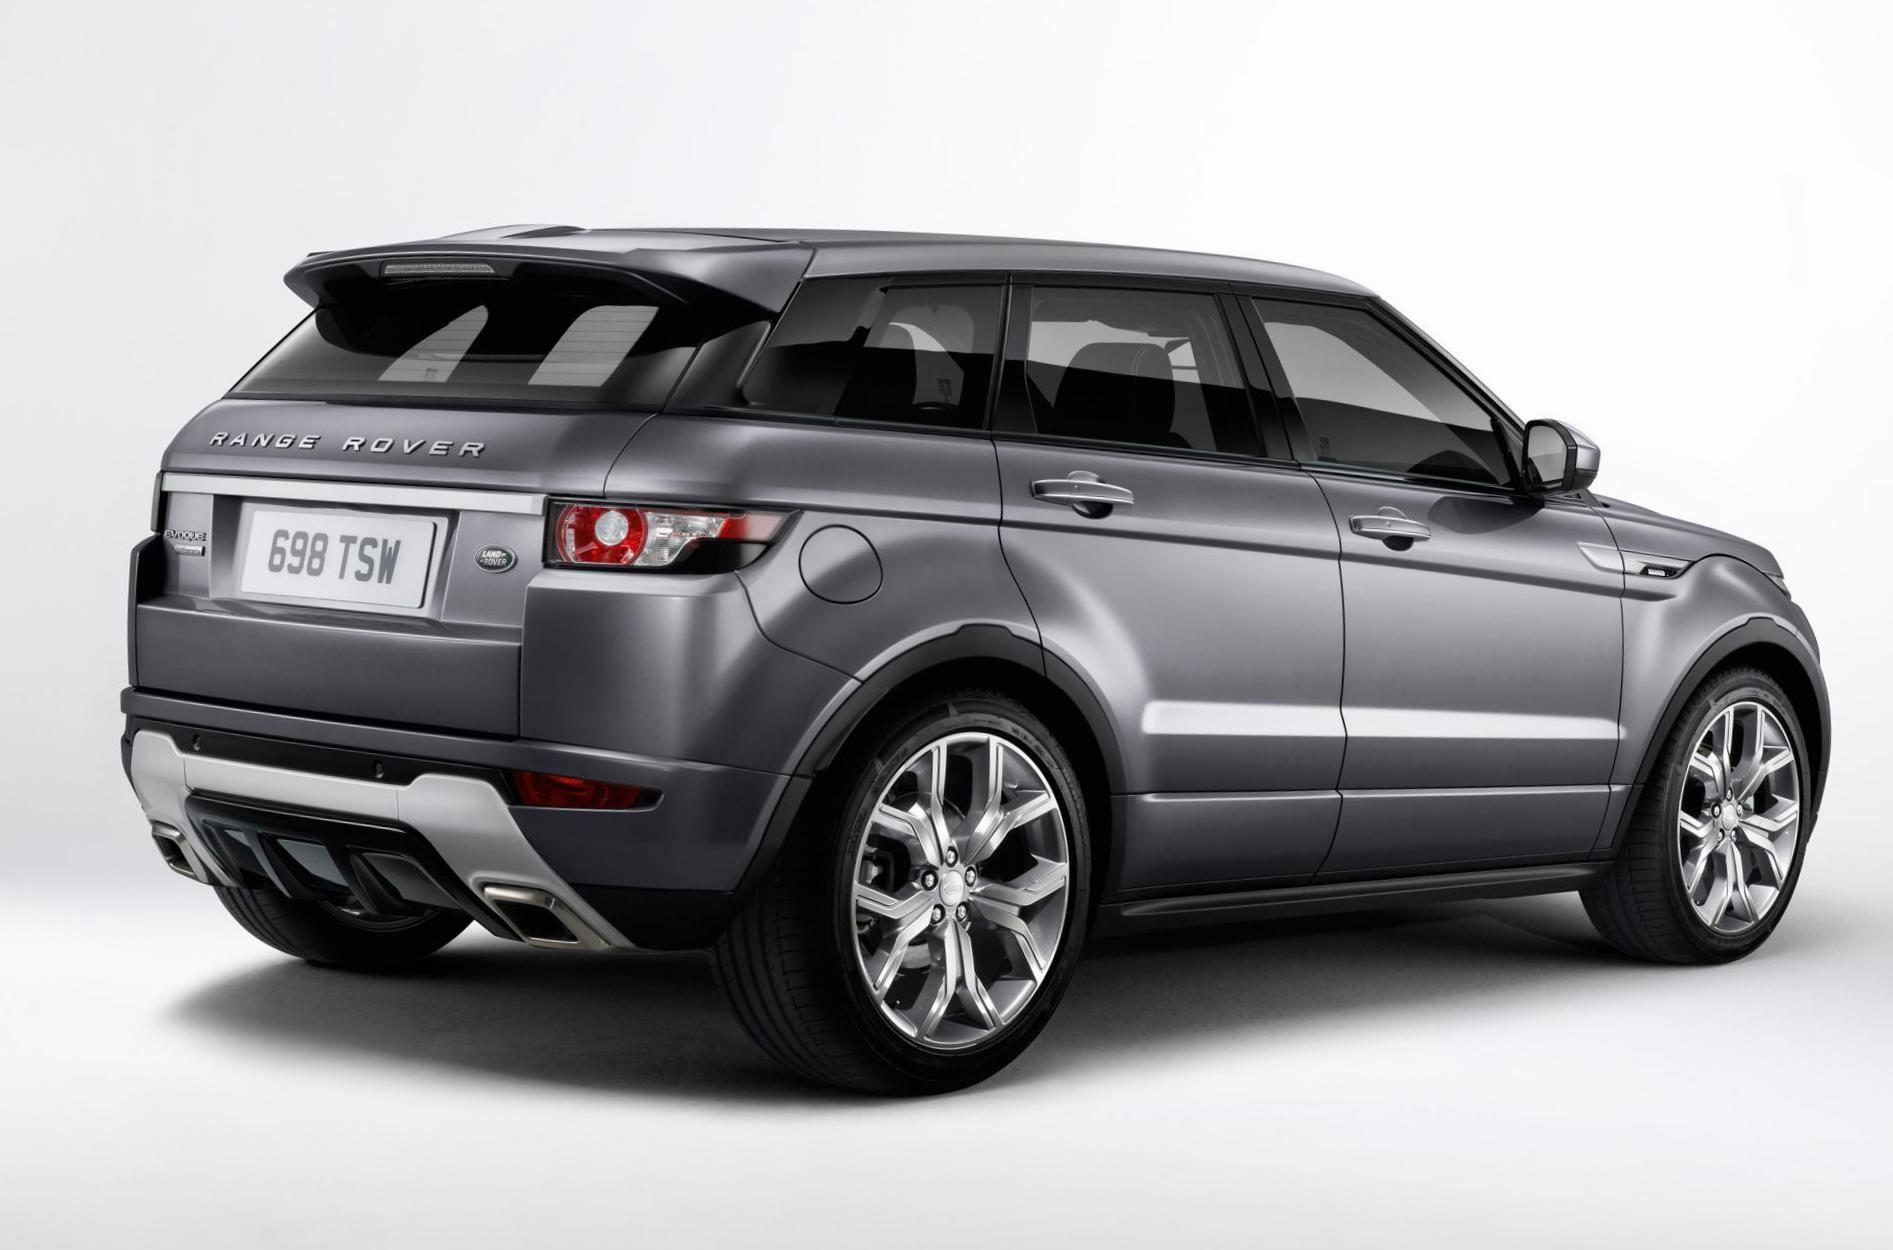 range rover evoque coupe land rover models http. Black Bedroom Furniture Sets. Home Design Ideas